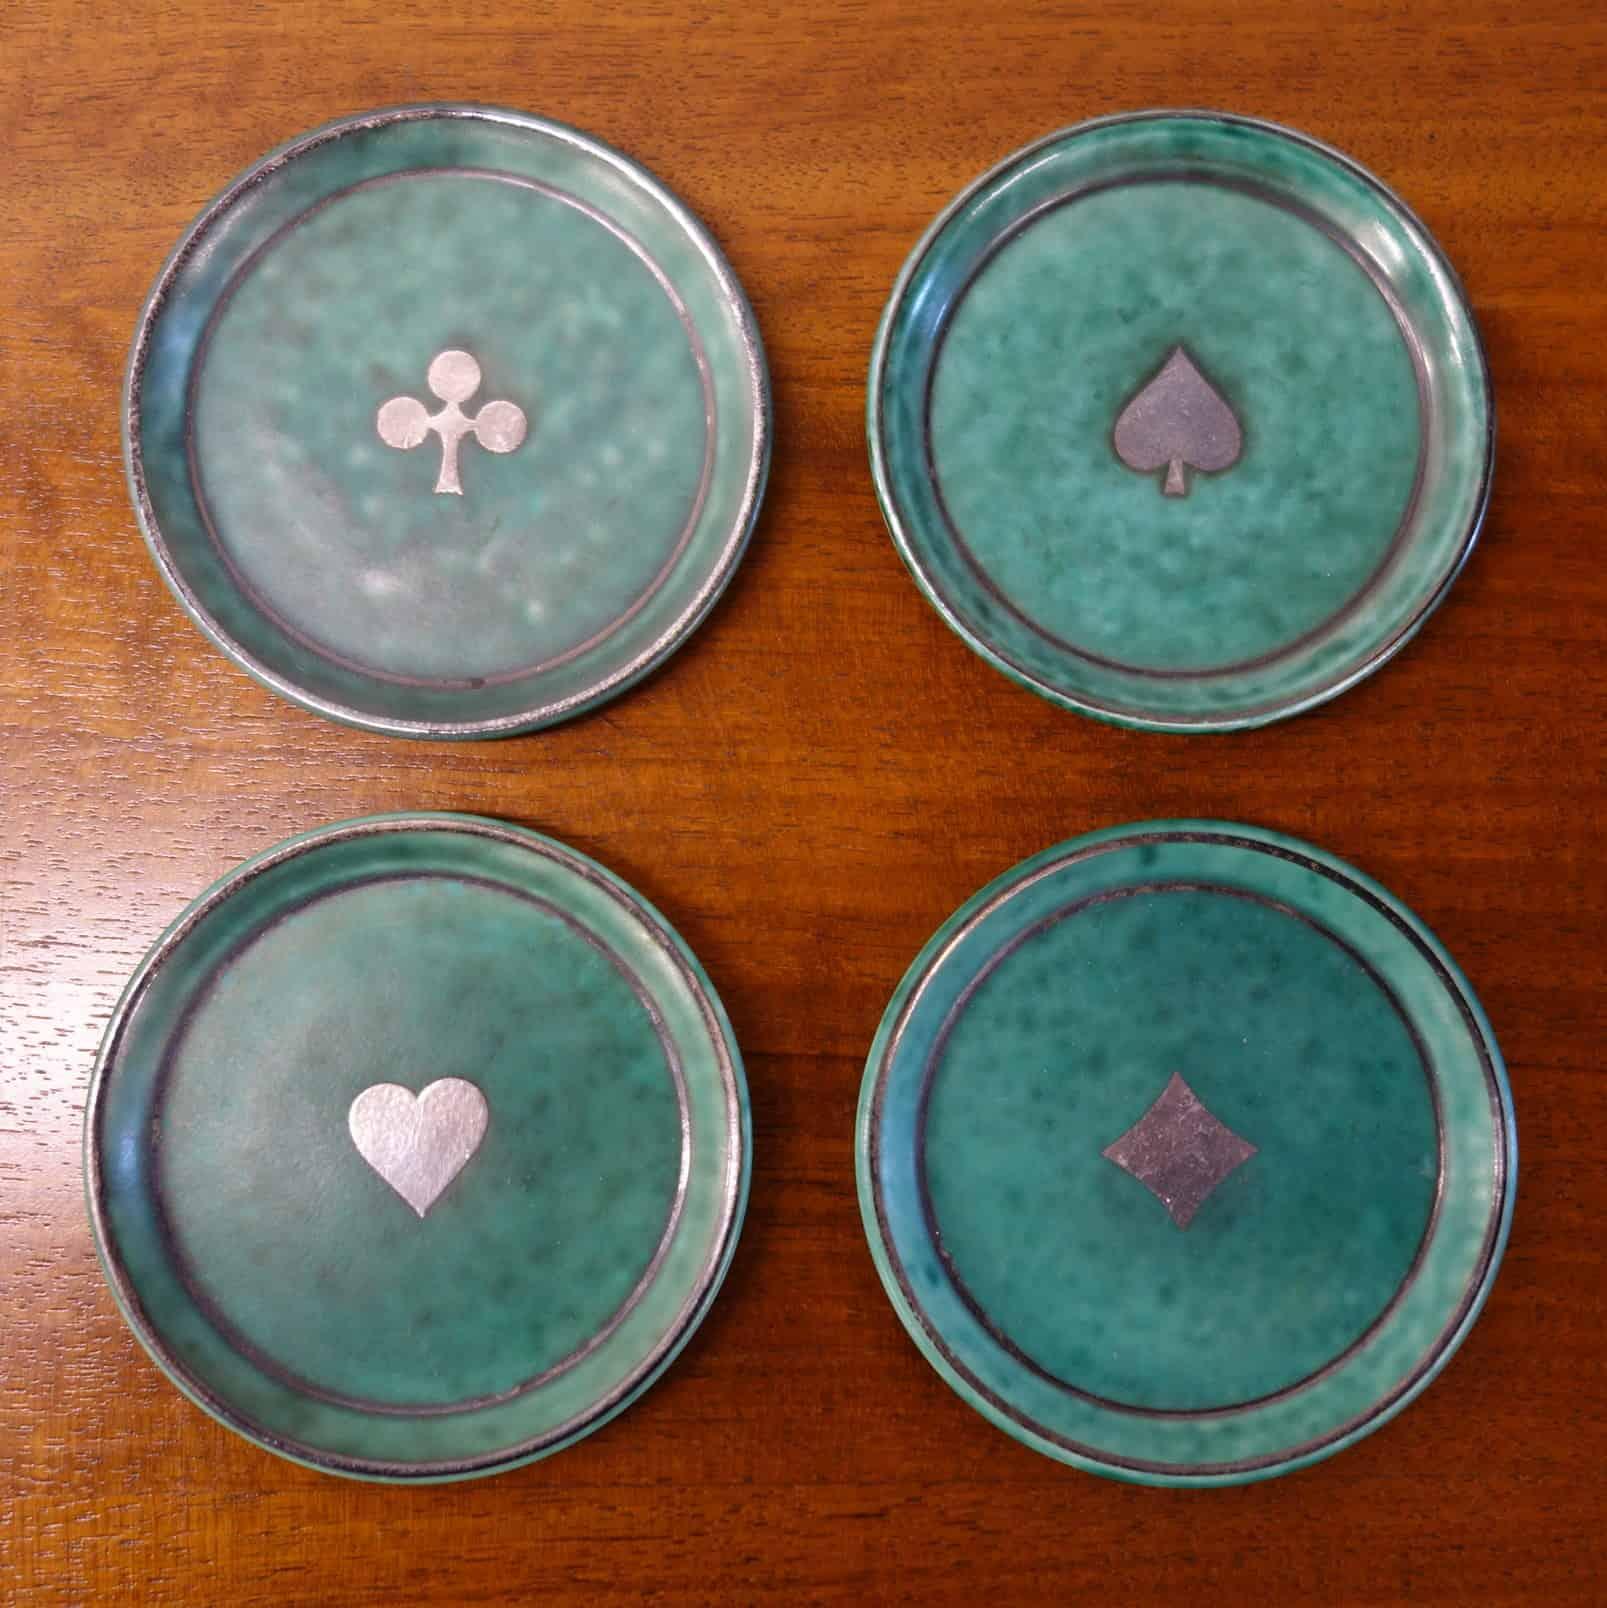 Argenta card symbol dishes by Gustavsberg